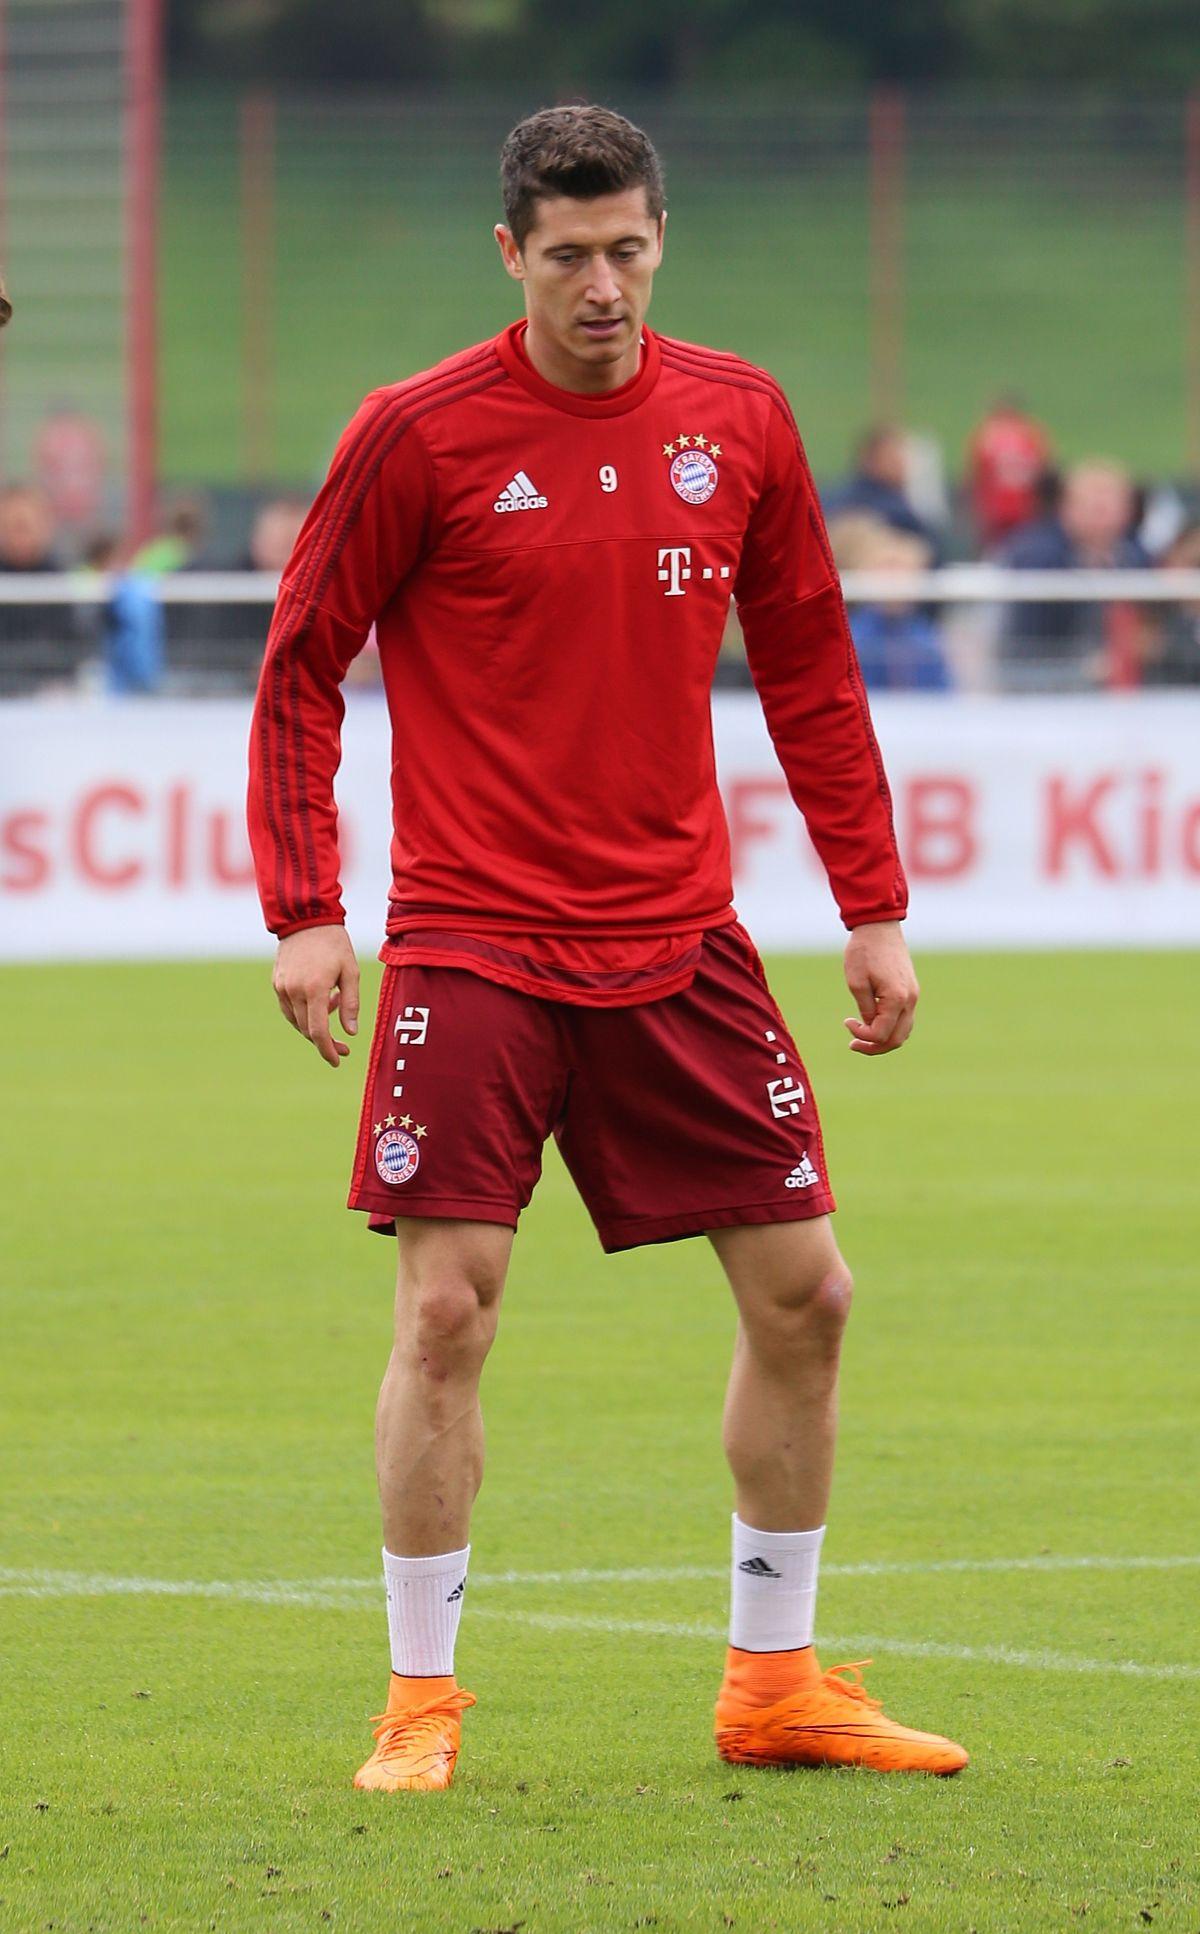 Torschützenkönig 2. Bundesliga